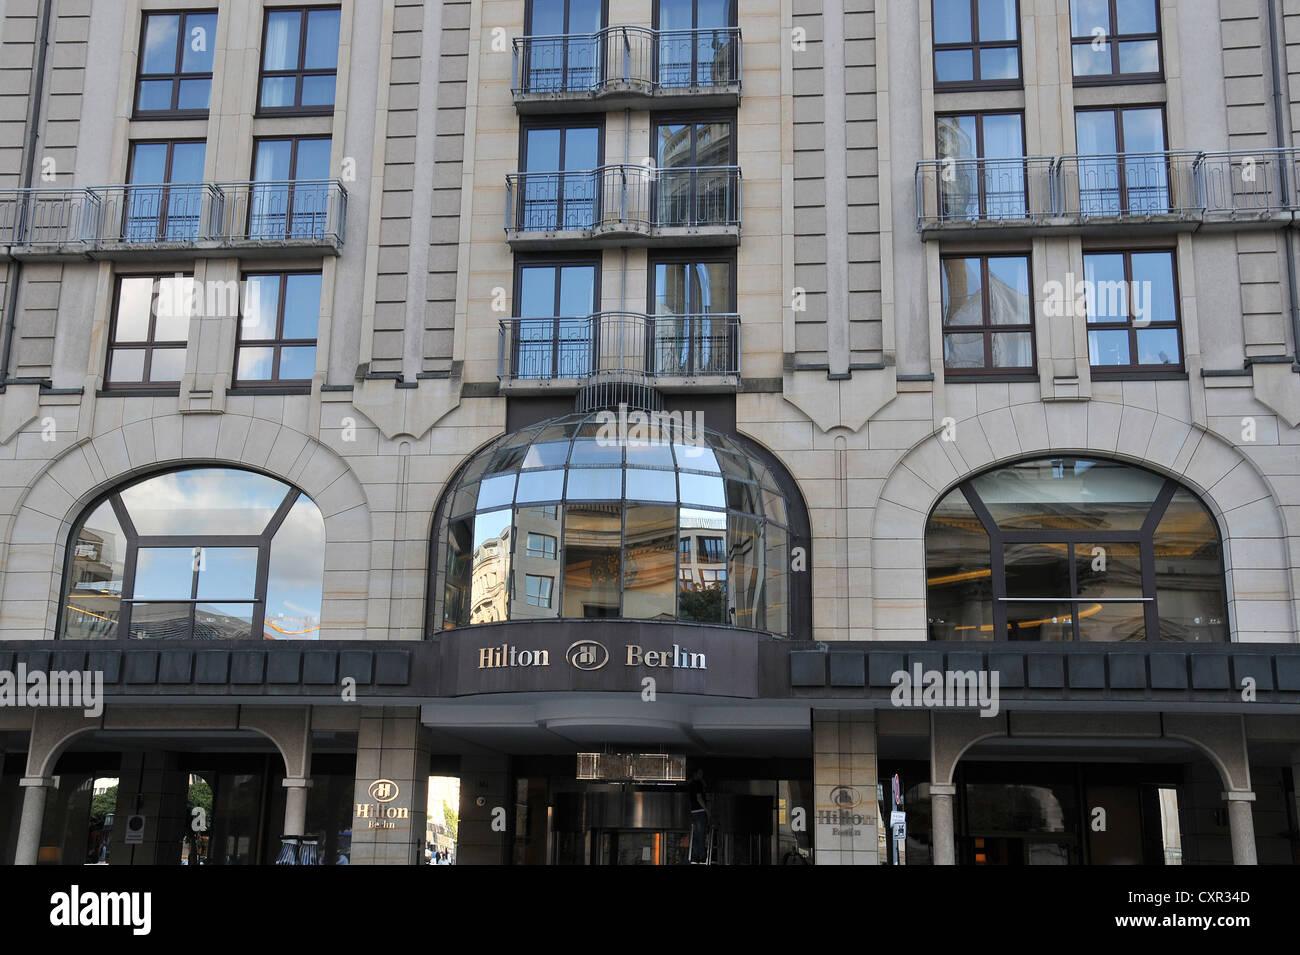 Hotel Hilton luxury luxe Berlin Germany - Stock Image